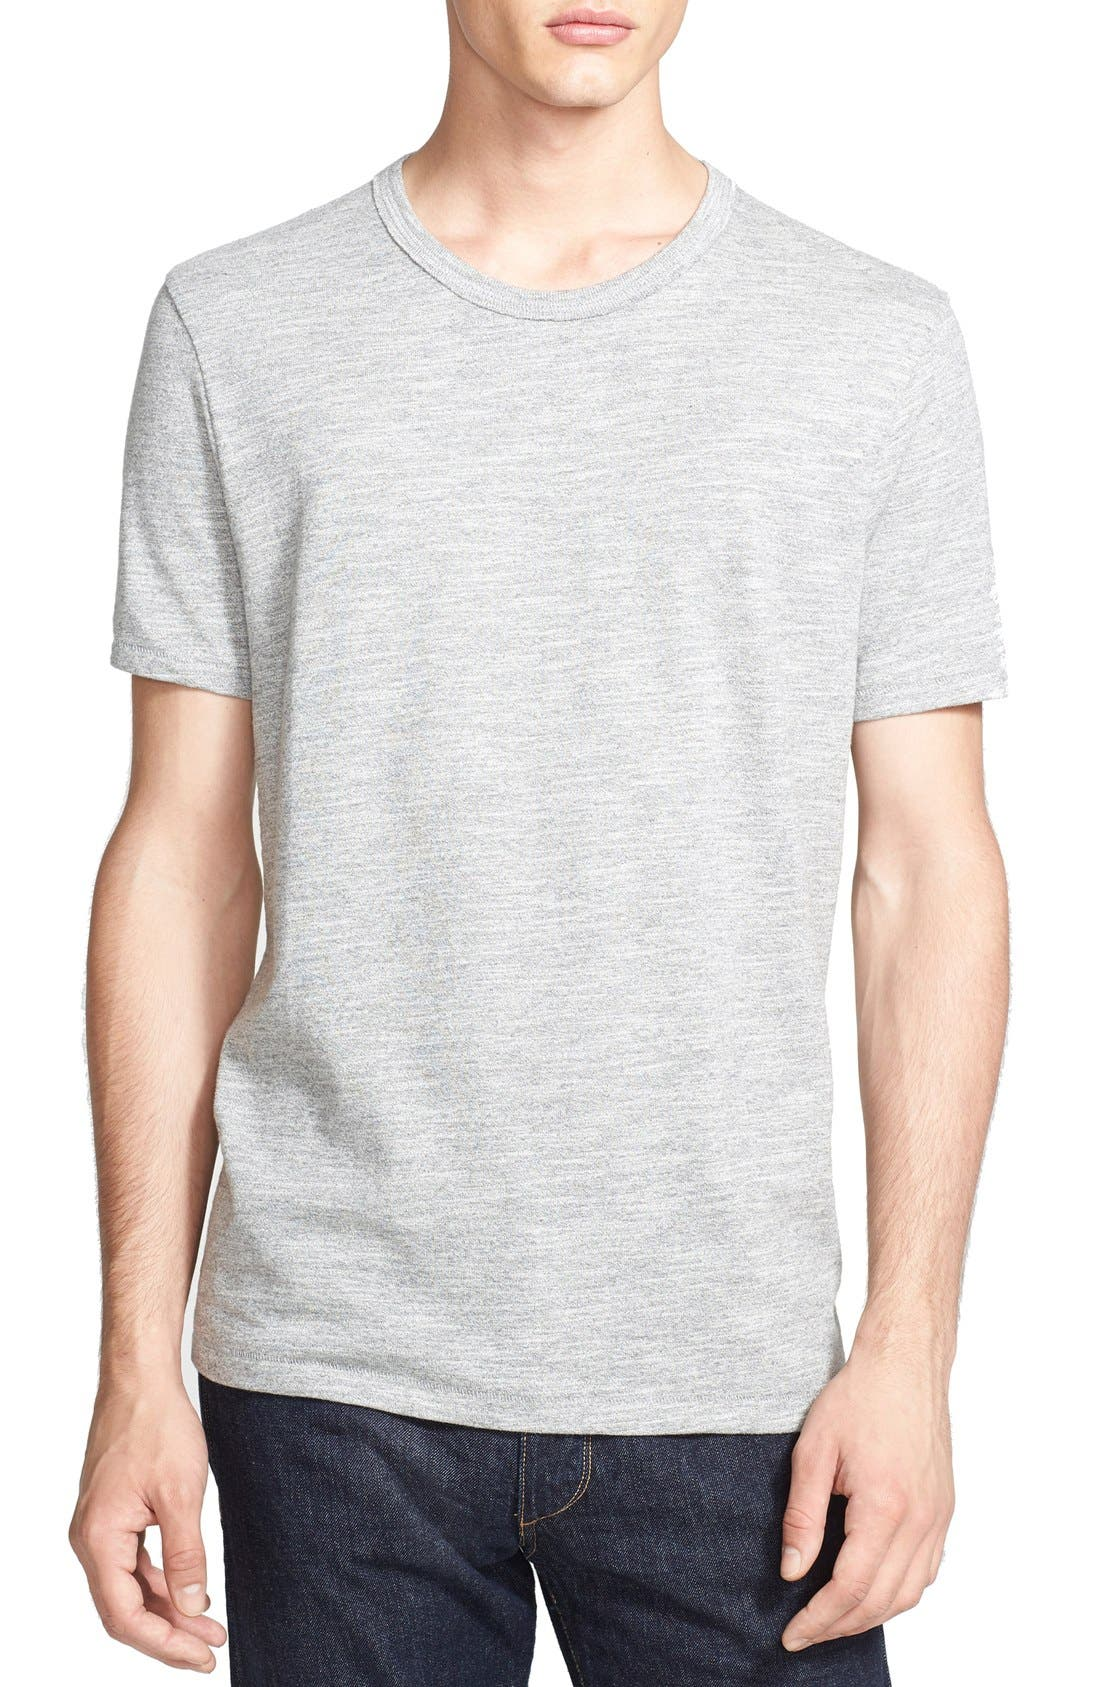 Main Image - rag & bone Standard Issue 'Moulinex' Crewneck T-Shirt